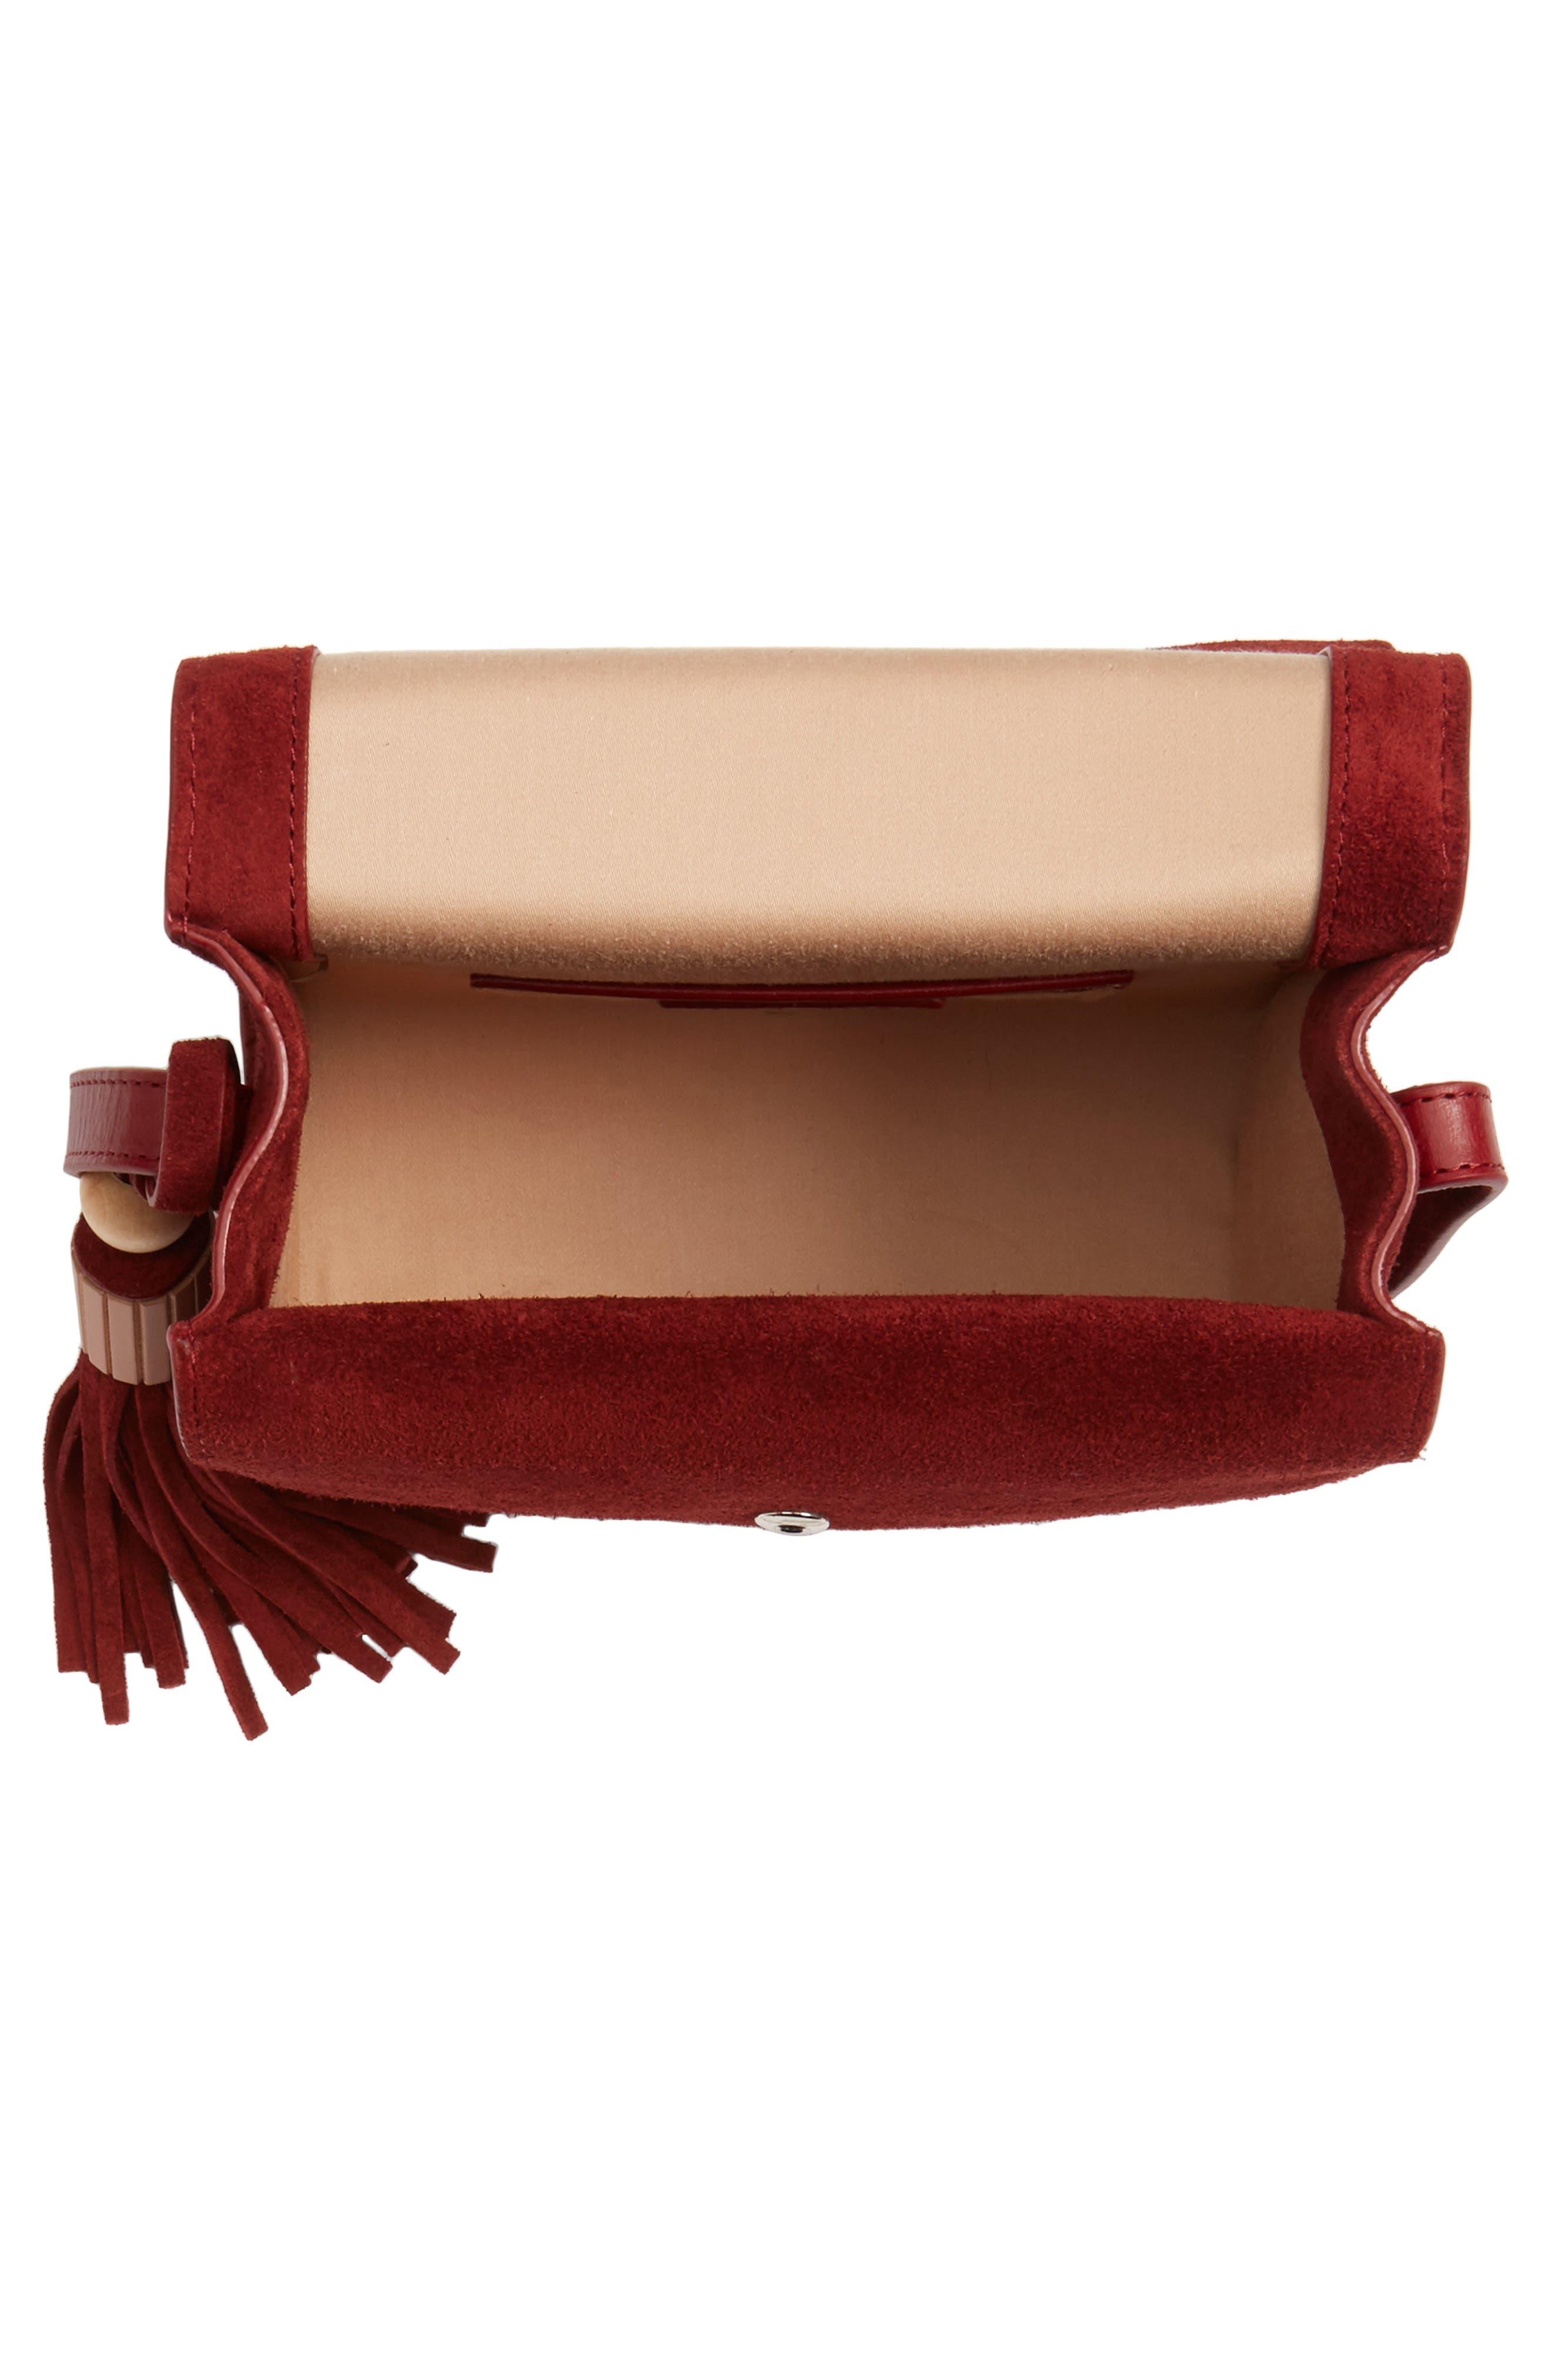 Eloise Field Crossbody Bag,                             Alternate thumbnail 4, color,                             612